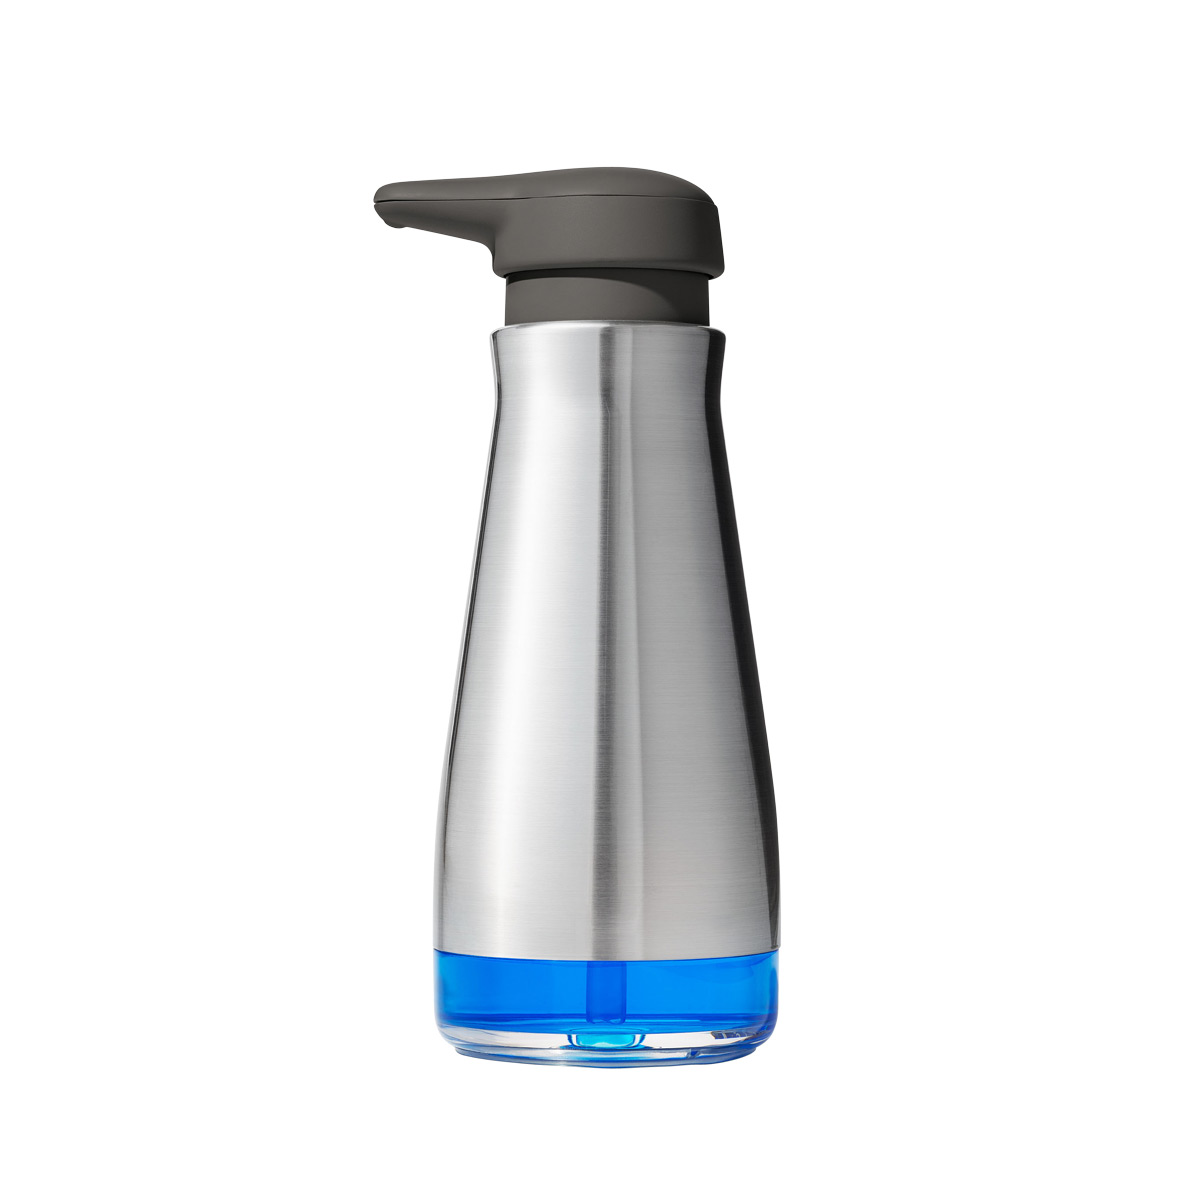 OXO 12 oz. Big Button Pump Dispenser